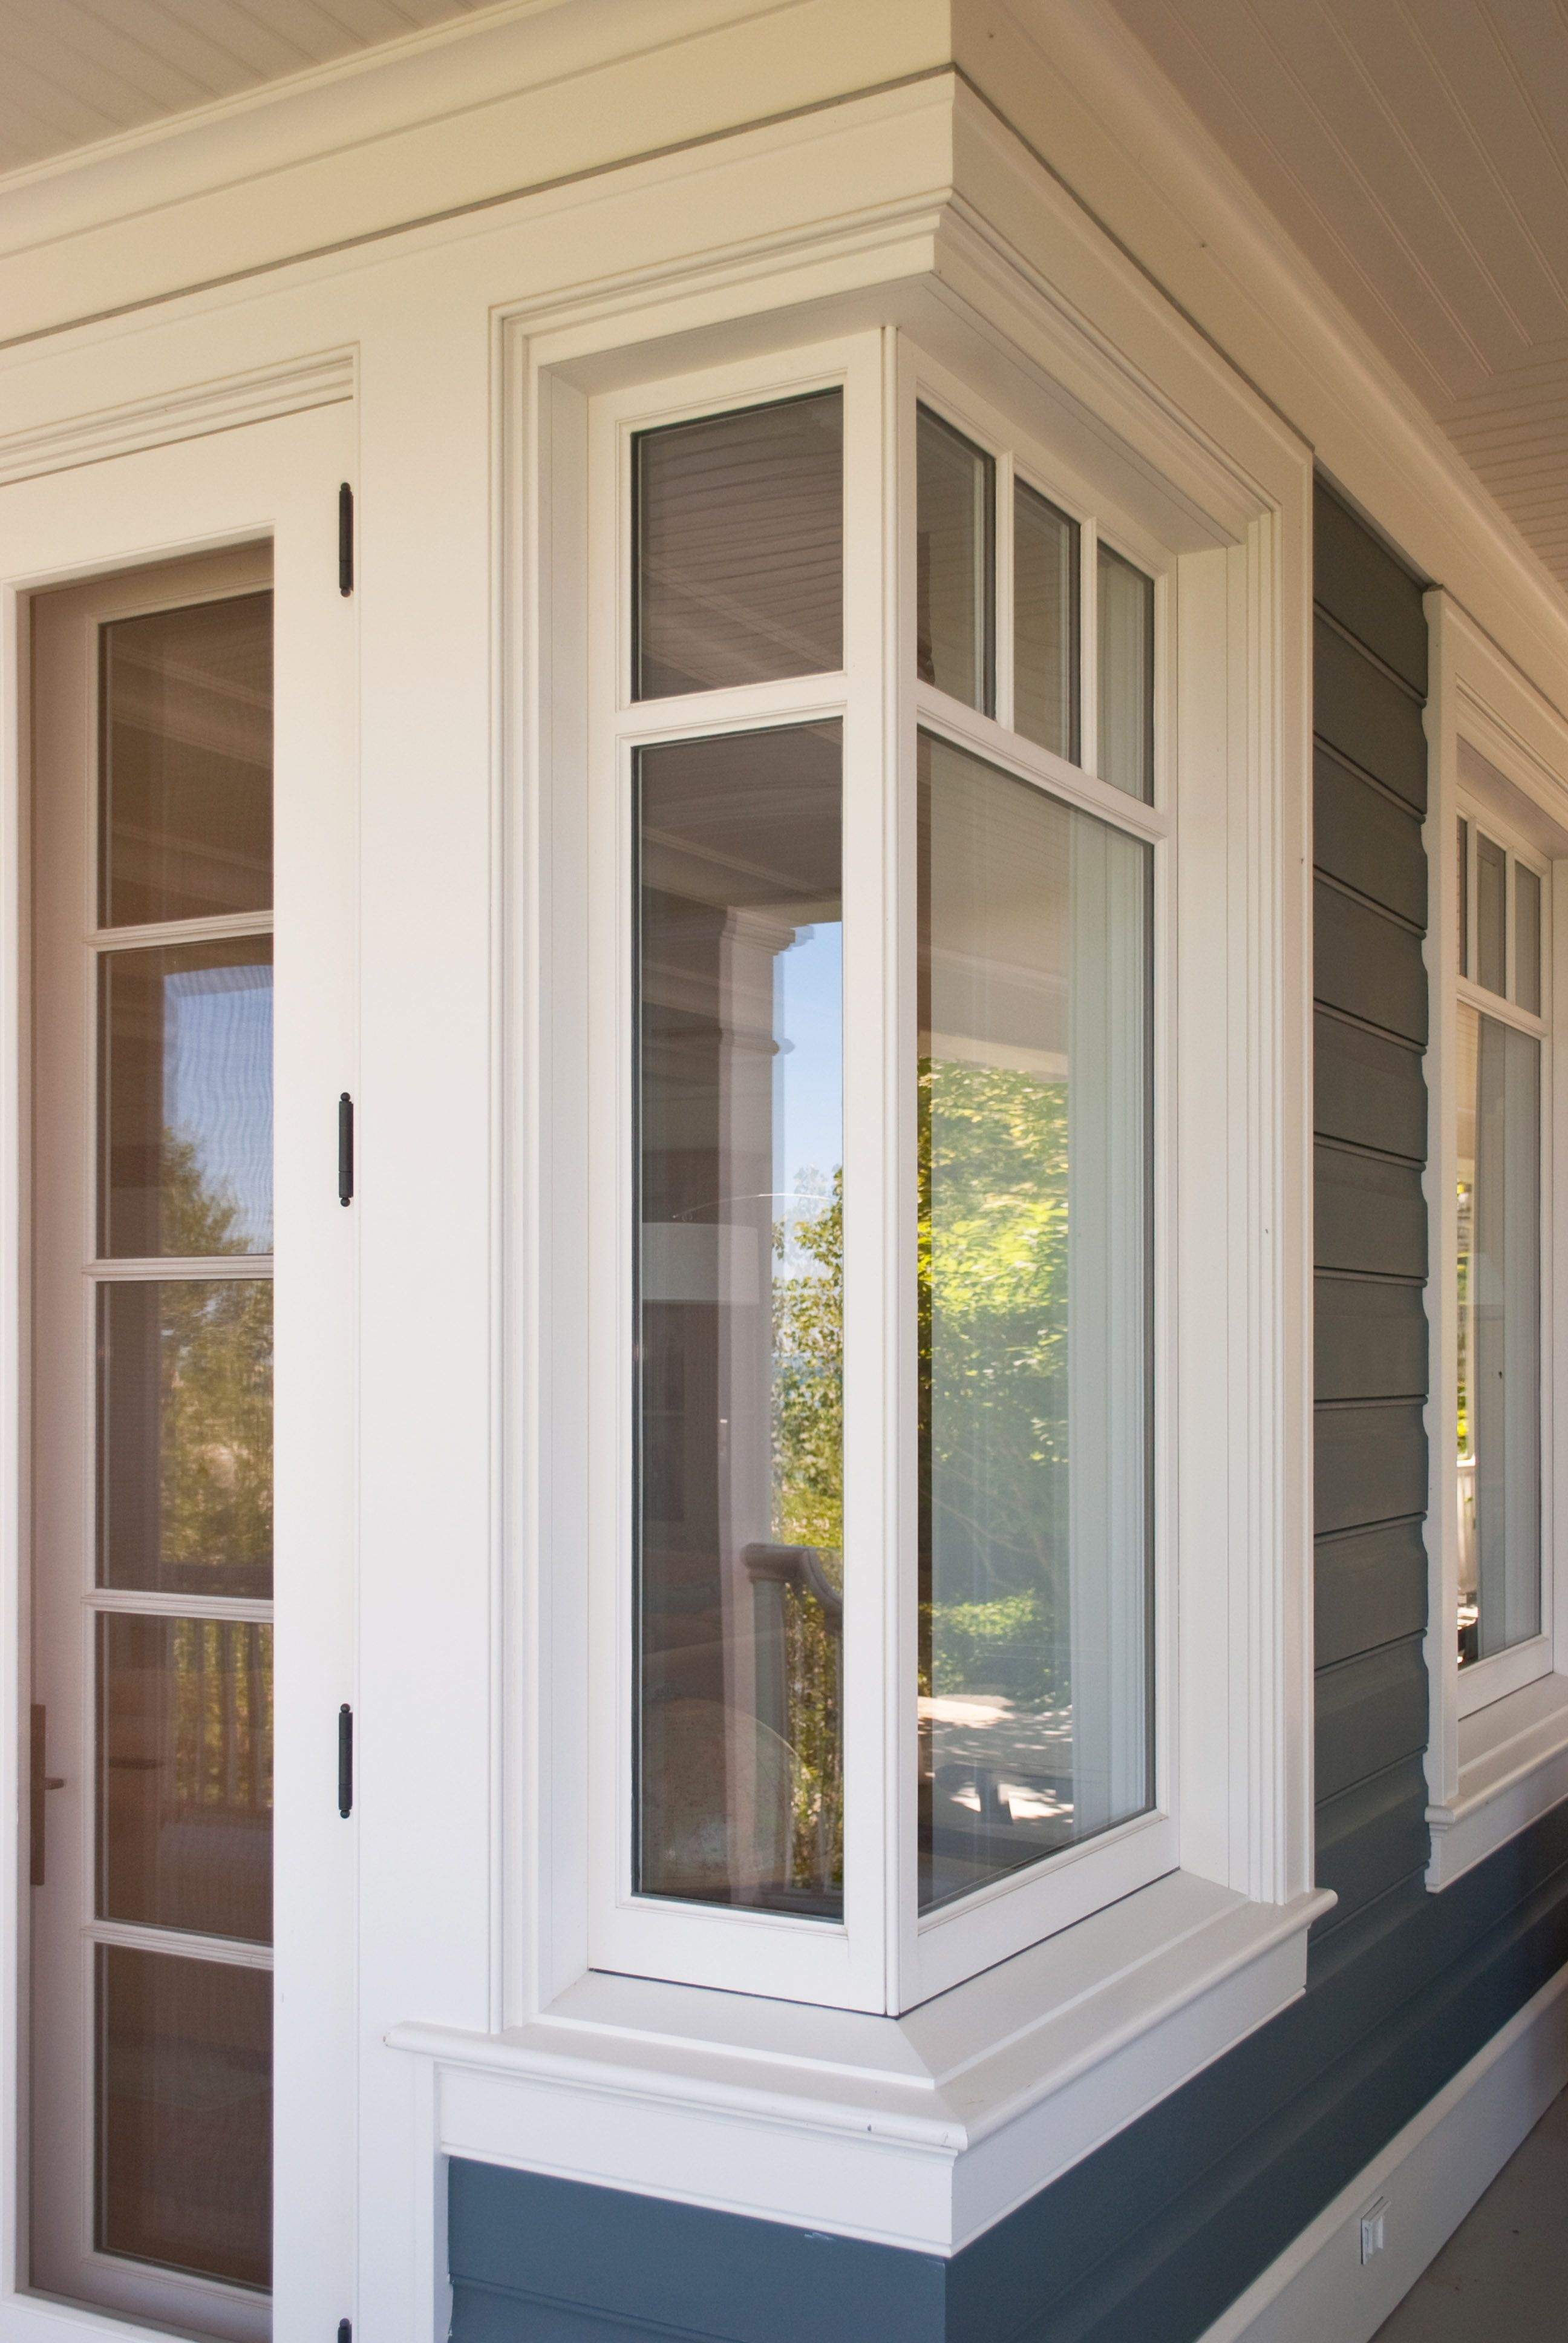 Heartwood Fine Windows And Doors Windows And Doors Windows Custom Windows